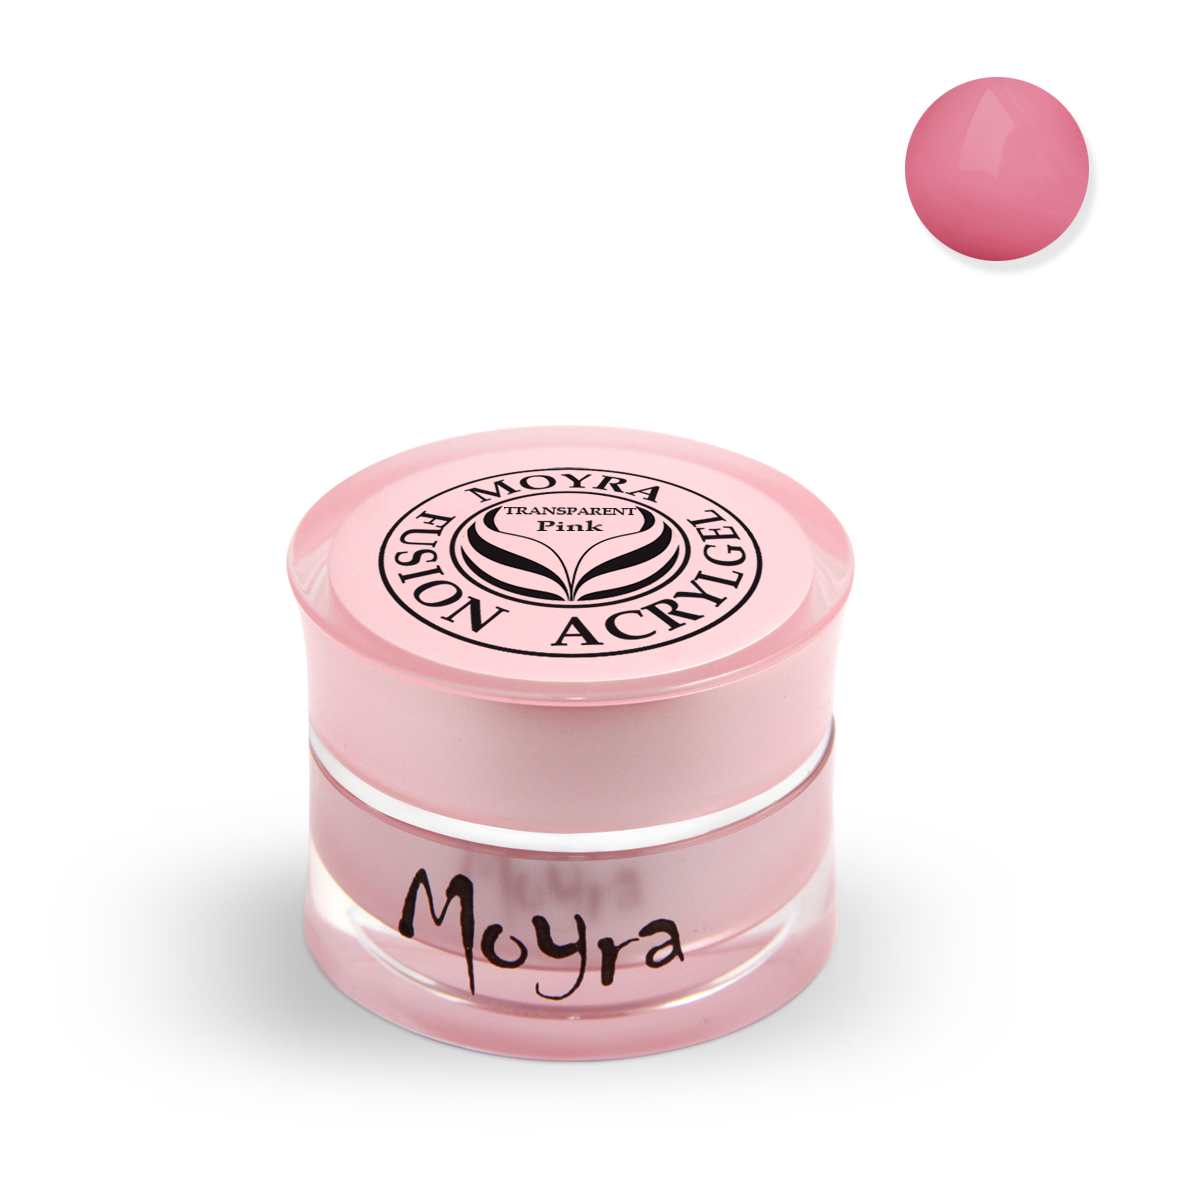 Fusion Acrylgel 5 g, Transparent Pink